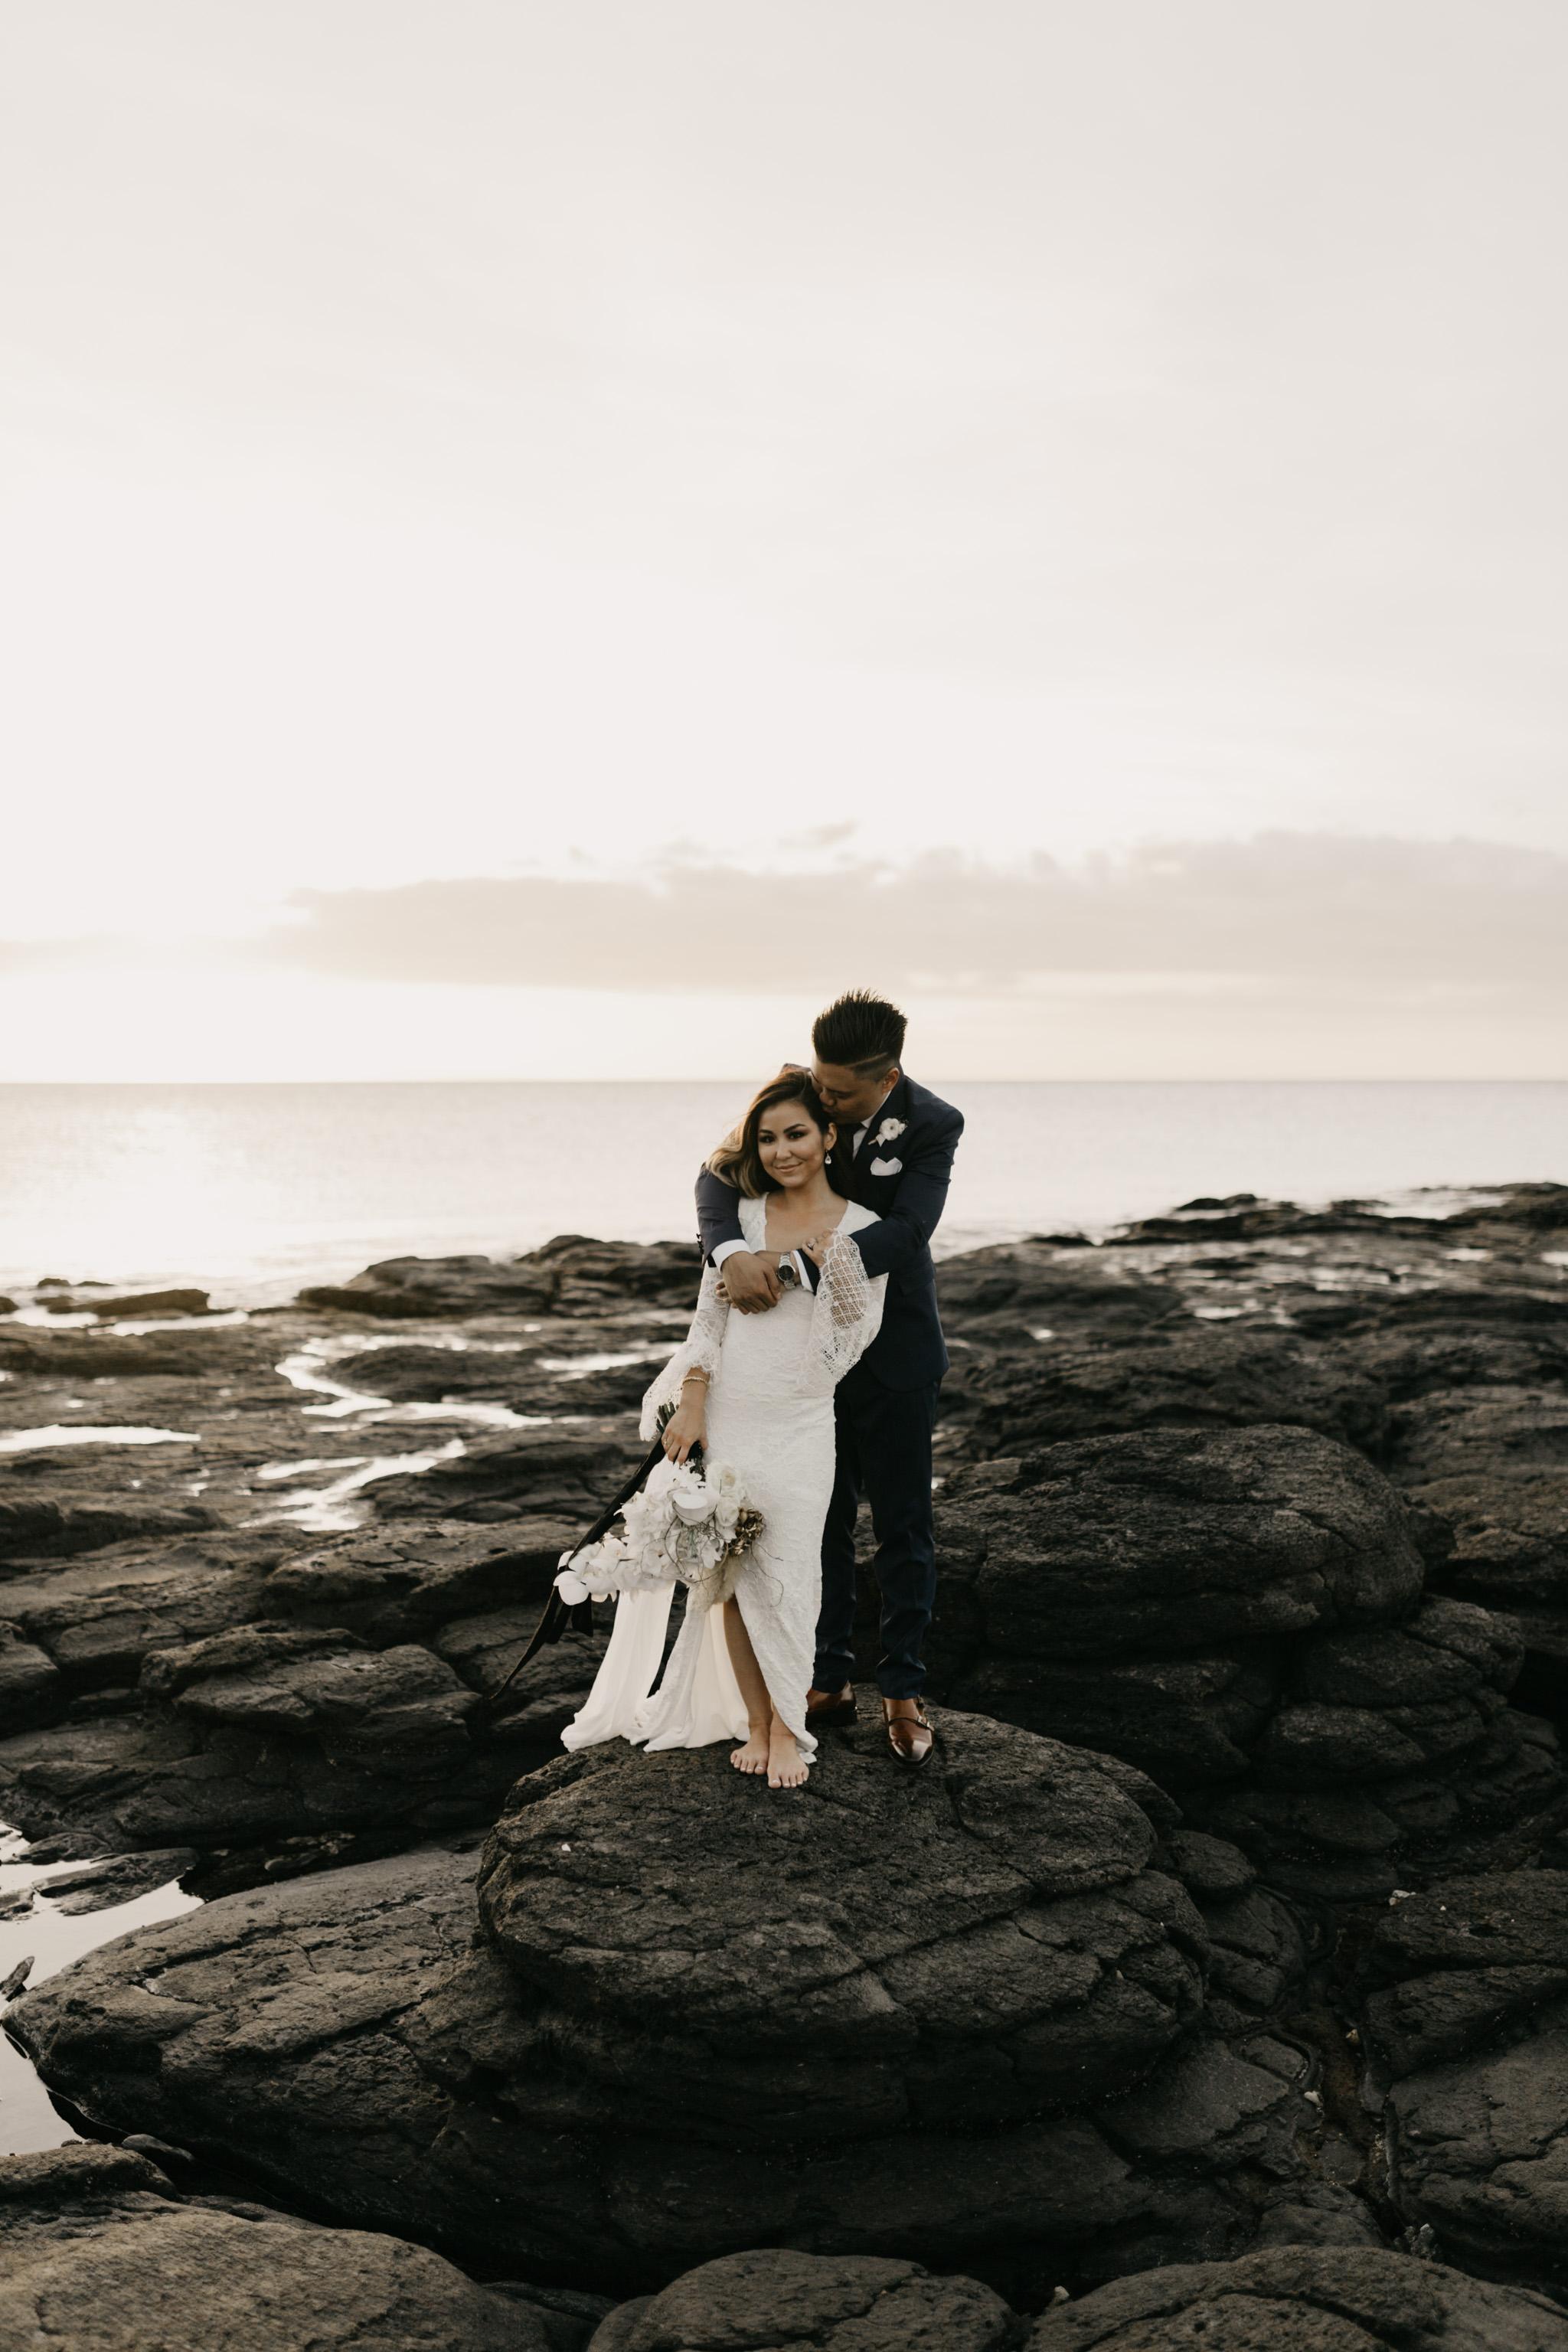 Beautiful sunset wedding portraits   Merriman's Kapalua Maui wedding by Hawaii wedding photographer Desiree Leilani